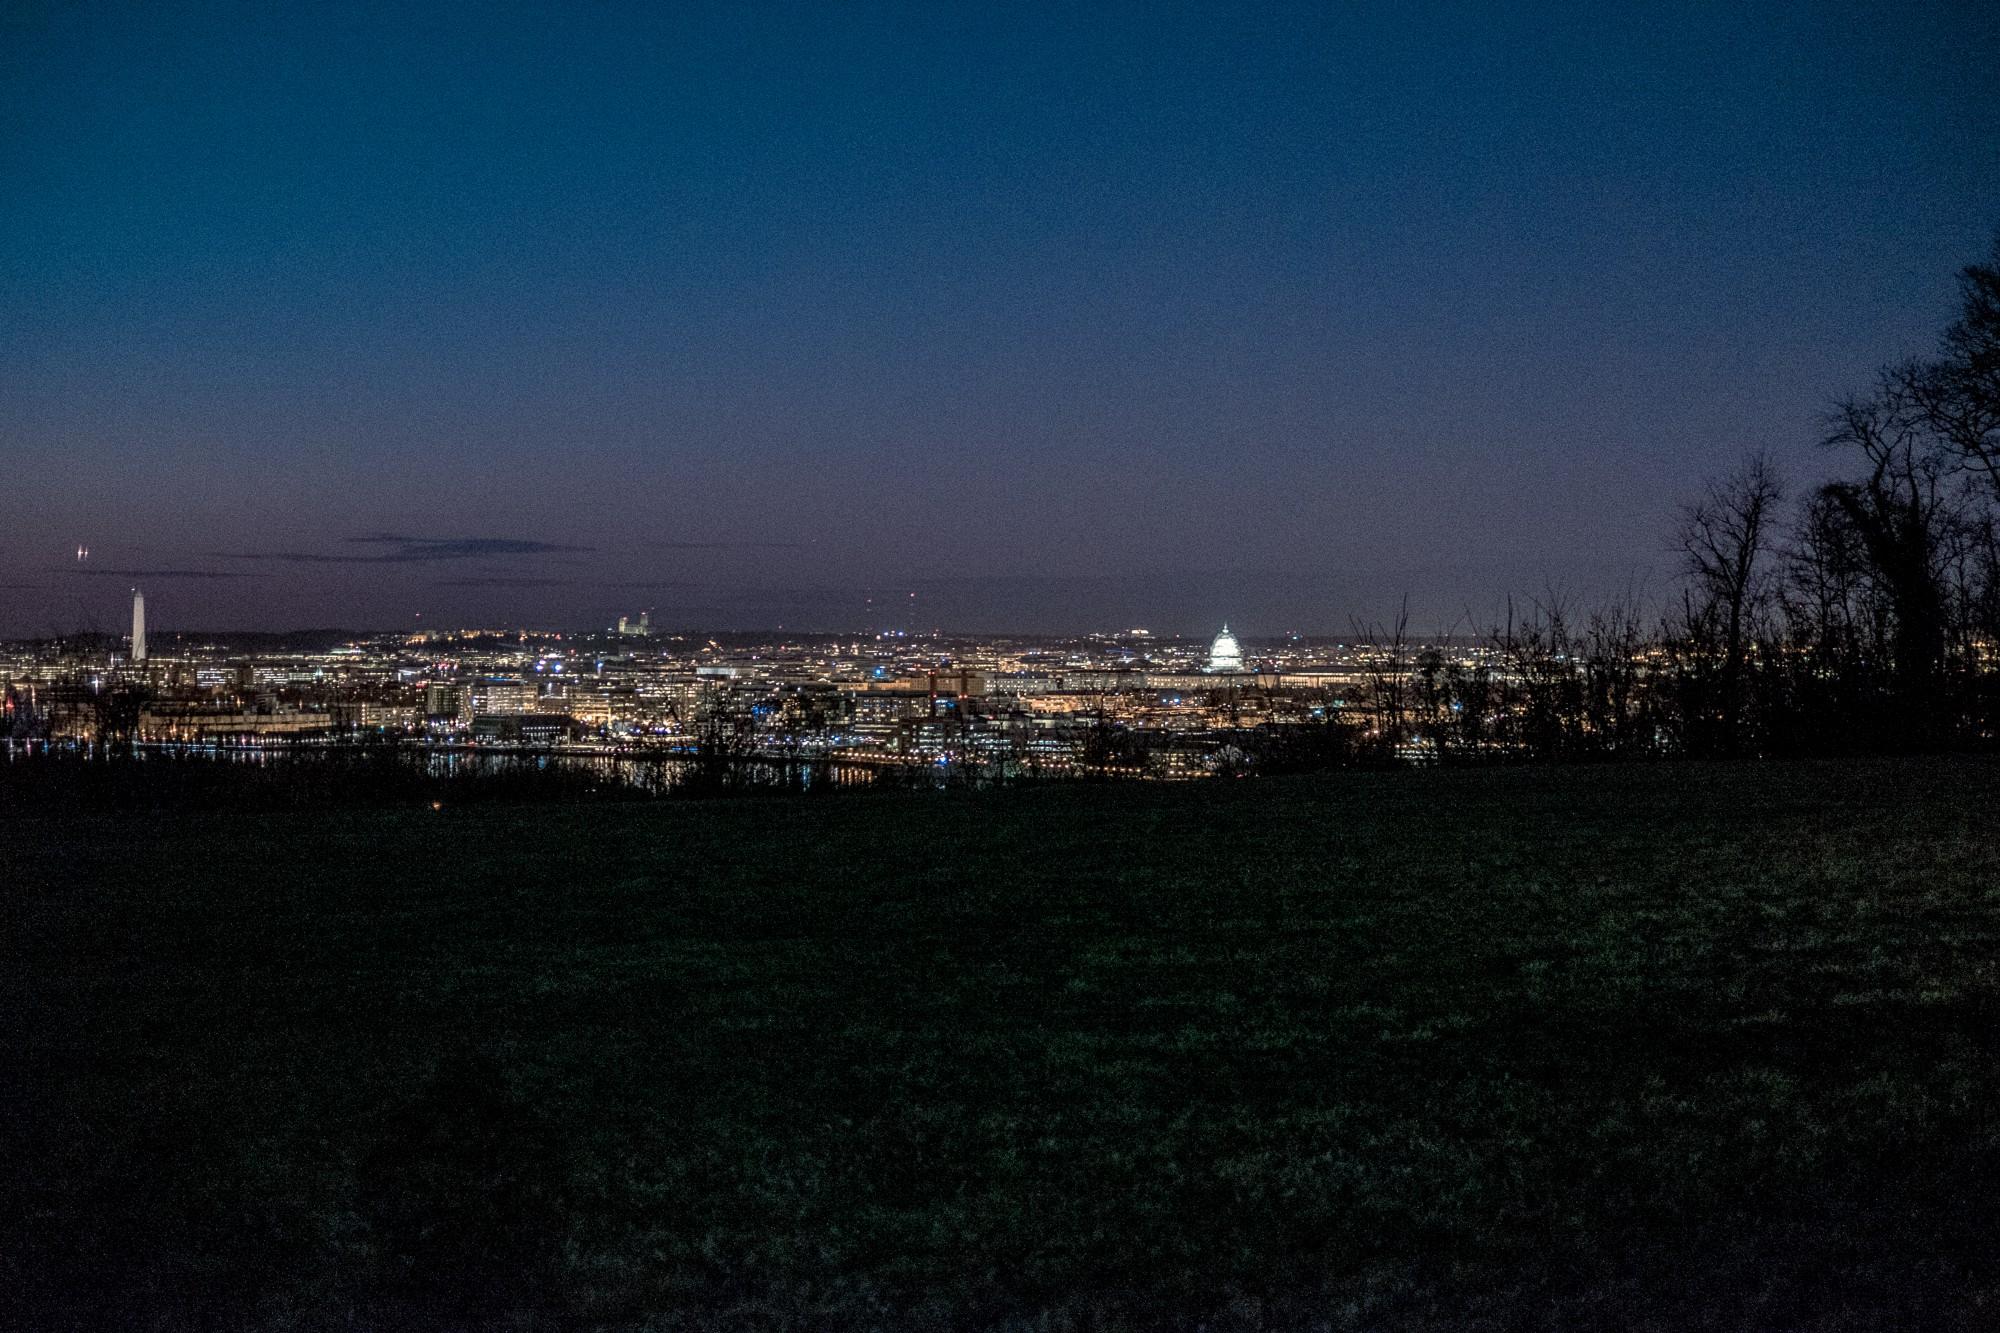 The Washington, D.C. skyline (Image captured by John Fisher)